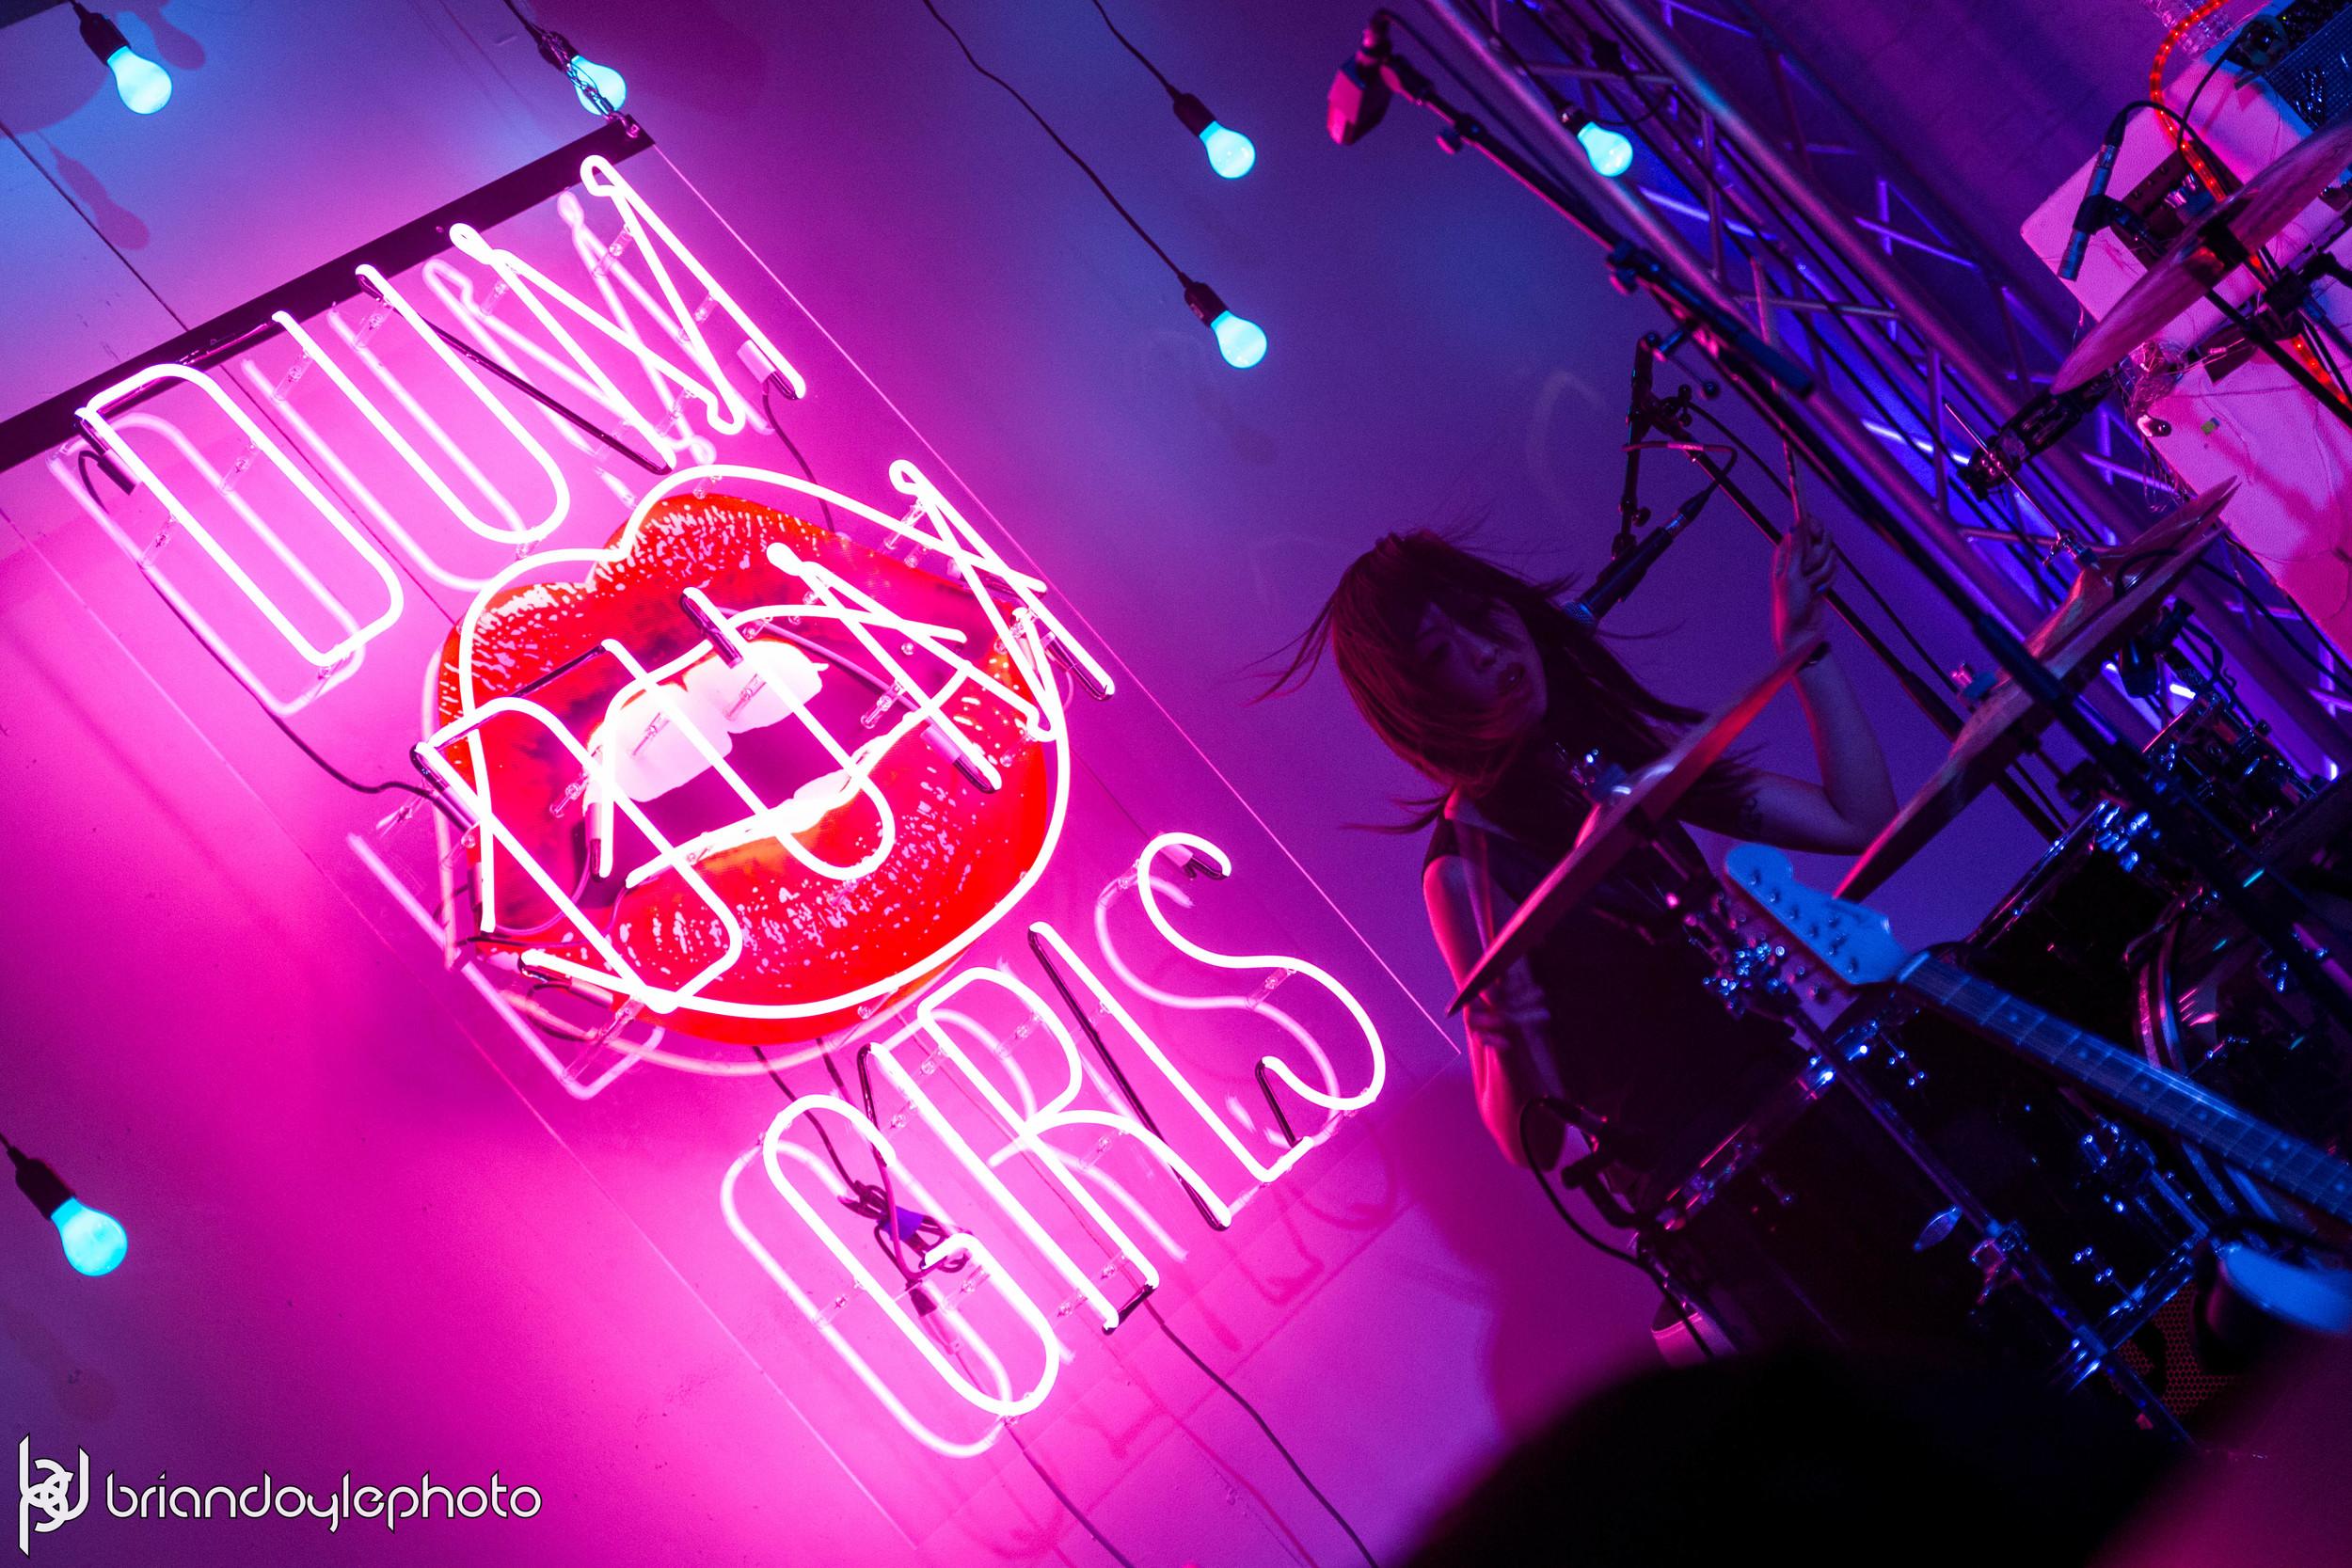 Red Bull - Dum Dum Girls, Tropicana and the Flea, Lowell @ The Well 2014.11.16-58.jpg